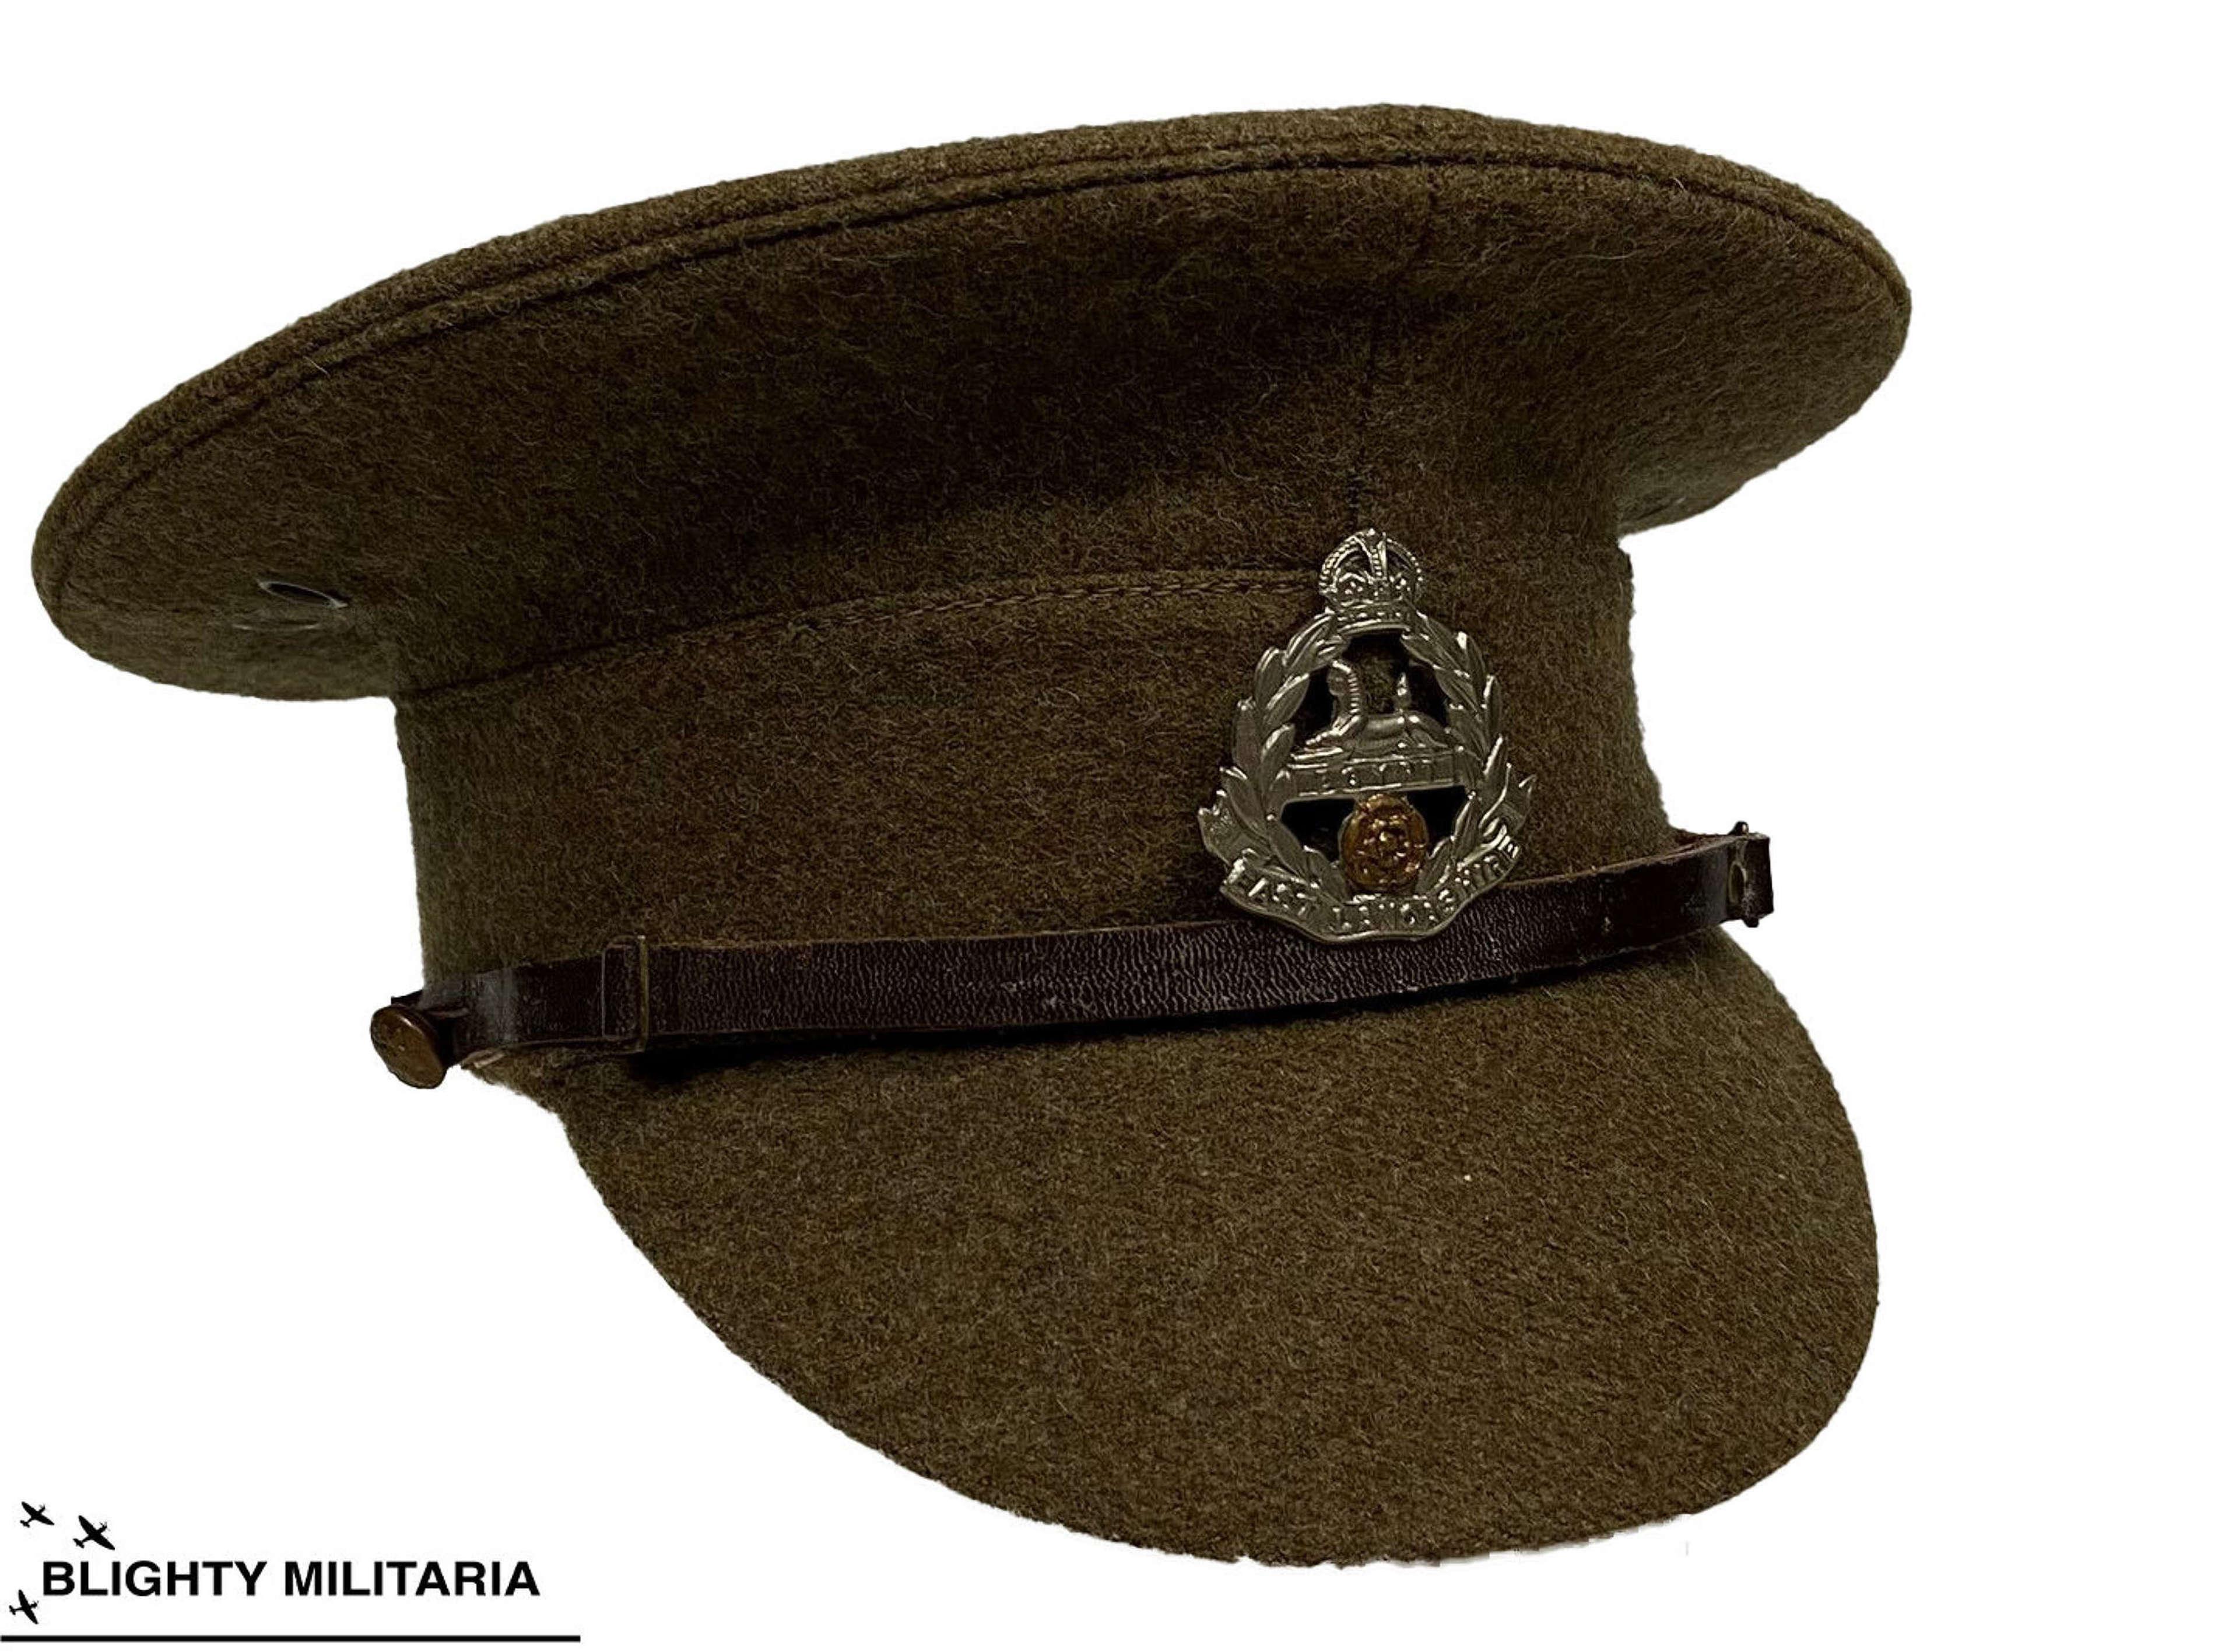 Original British Army 1922 Pattern Service Dress Cap - 6 3/8